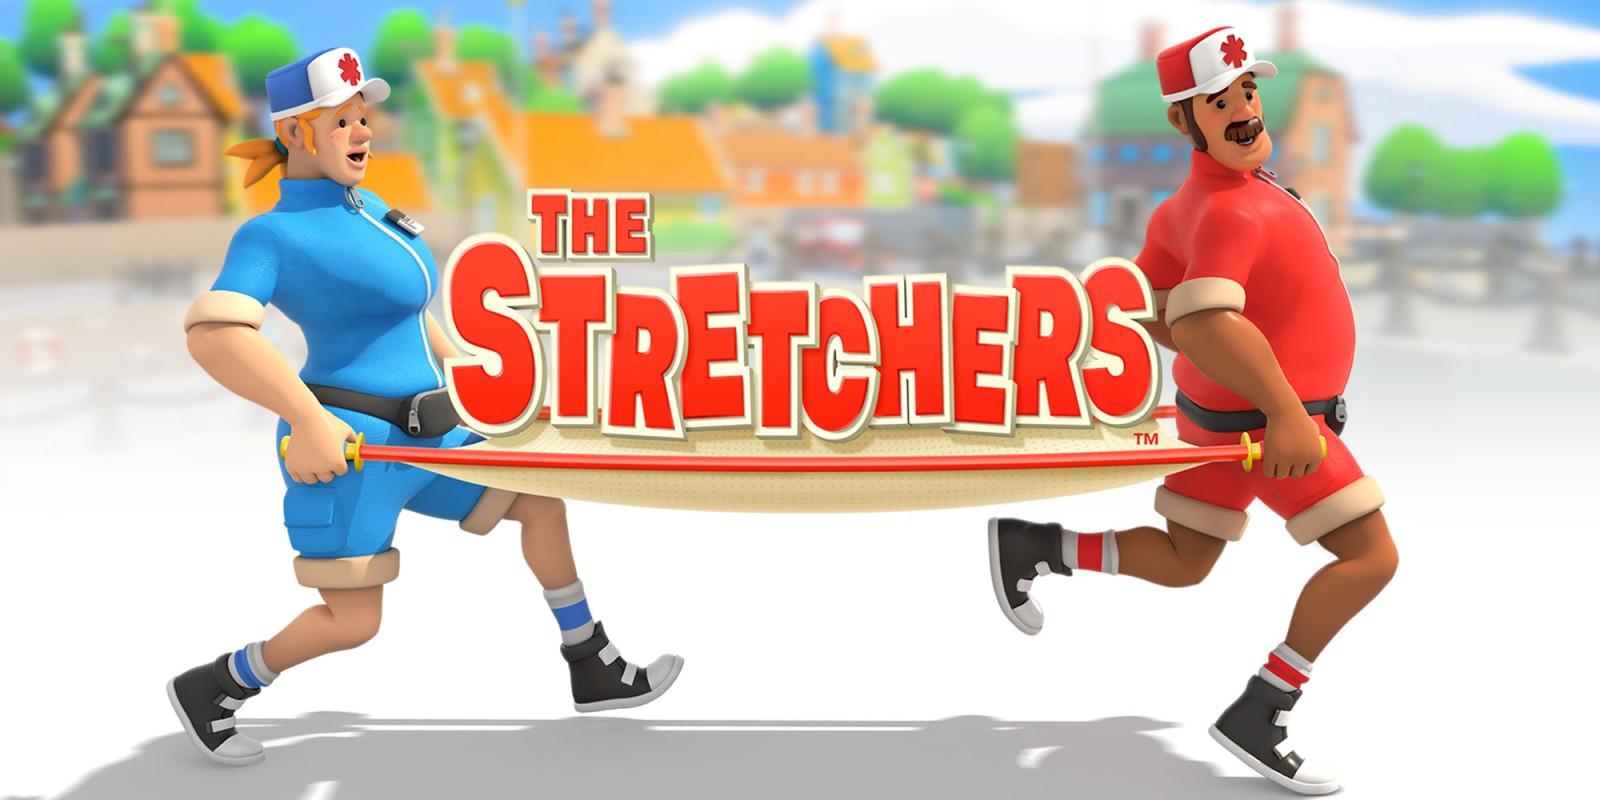 The stretchers